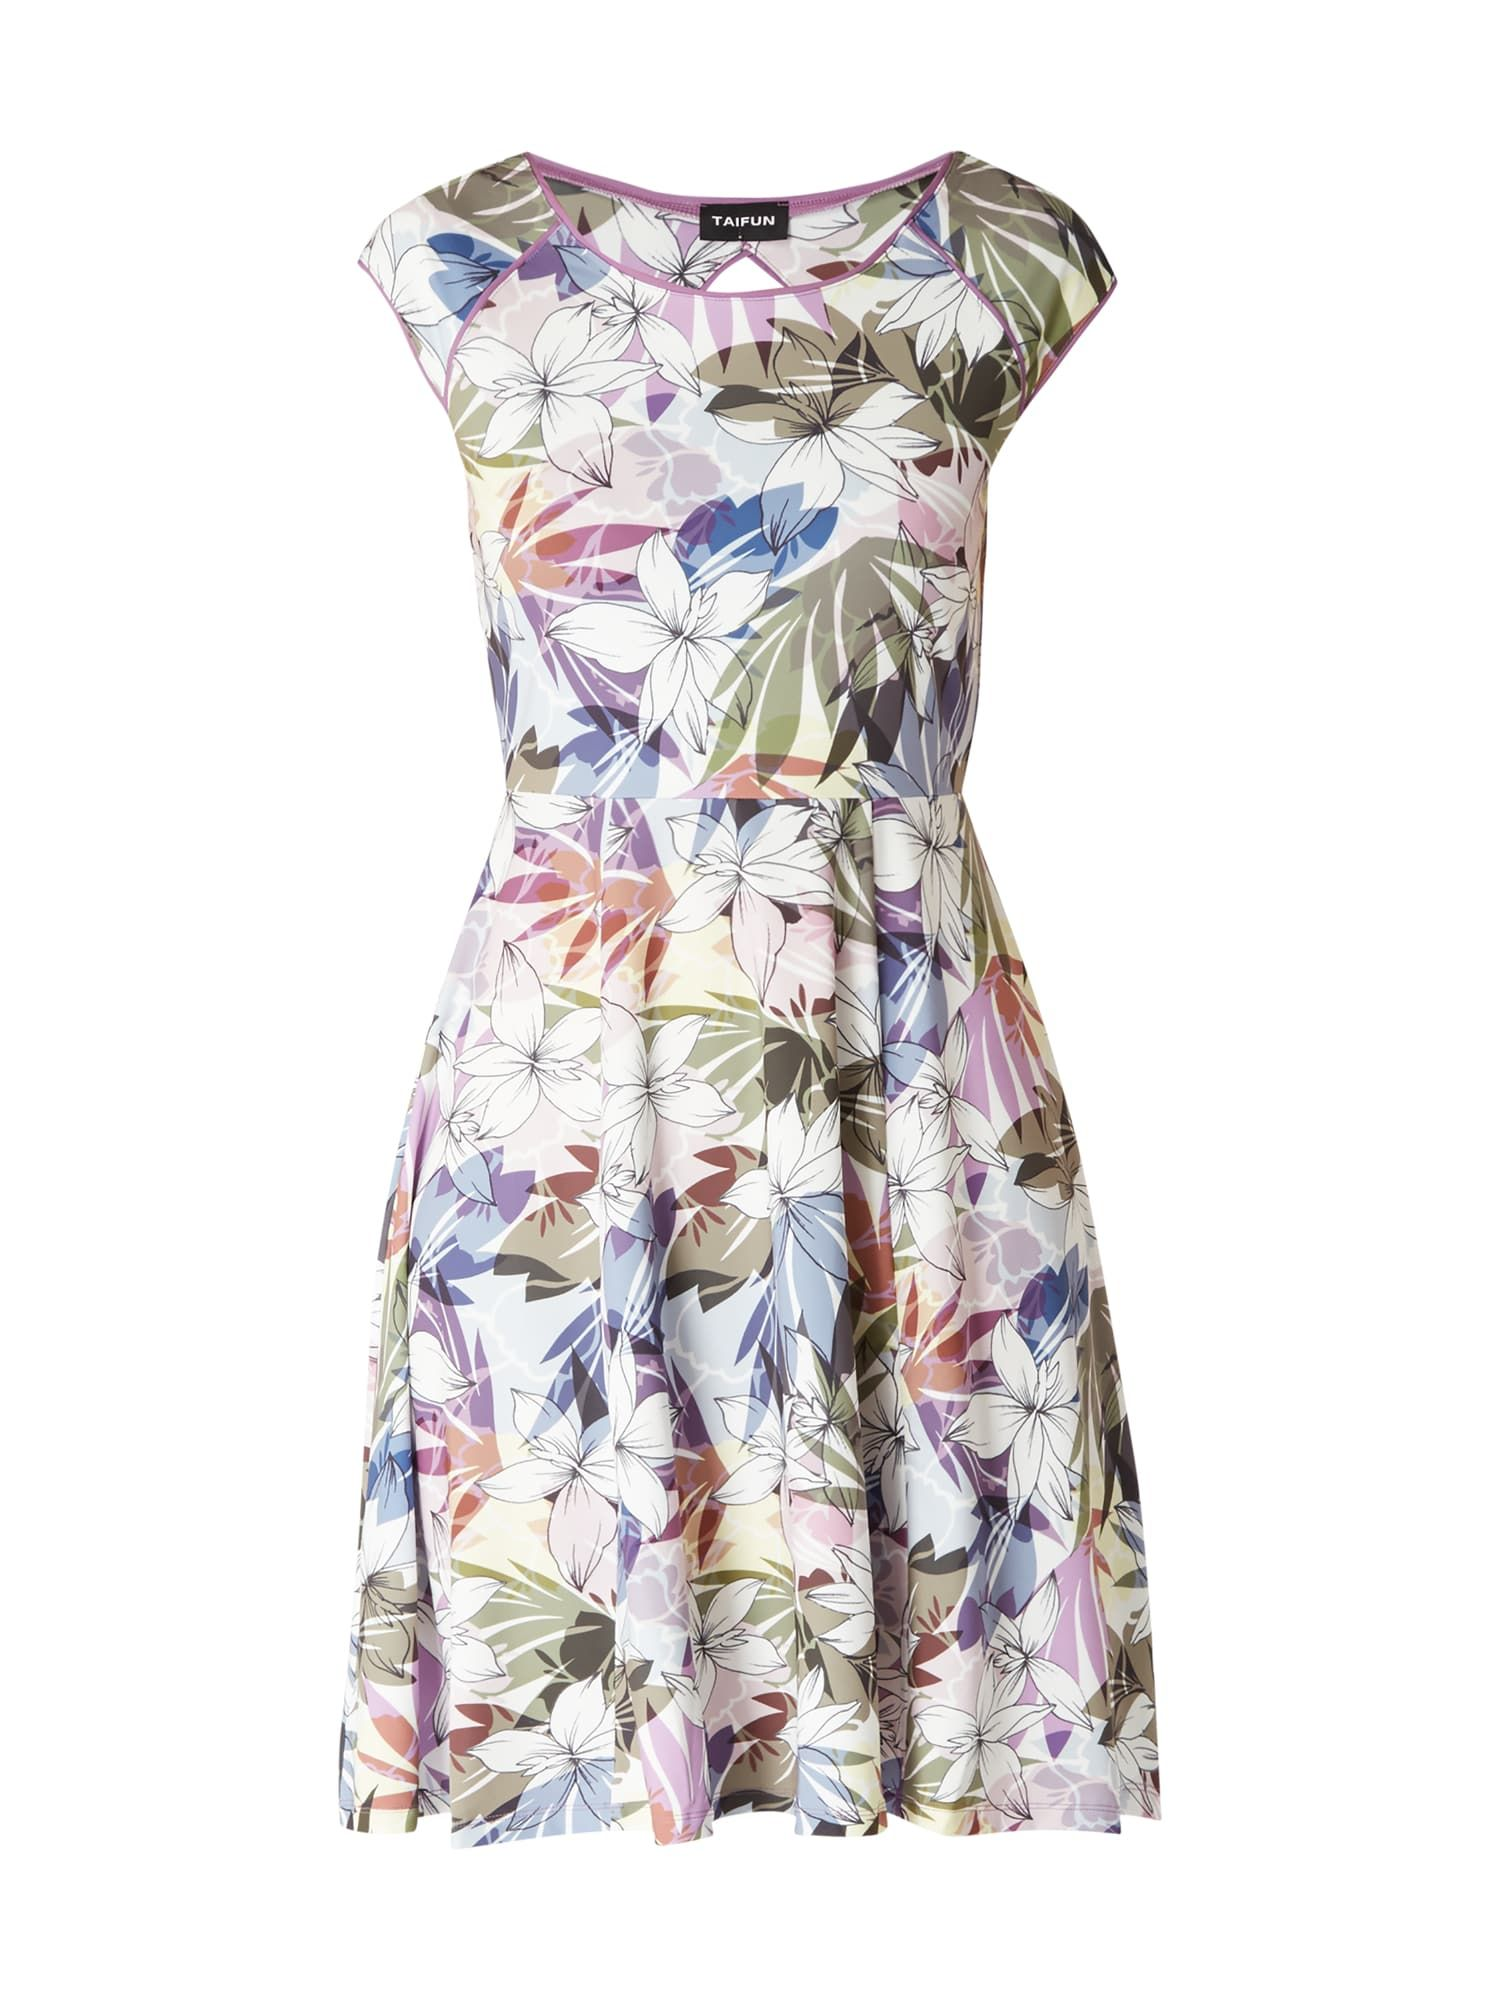 Taifun - Kleid mit floralem Muster - Olivgrün in 2020 ...